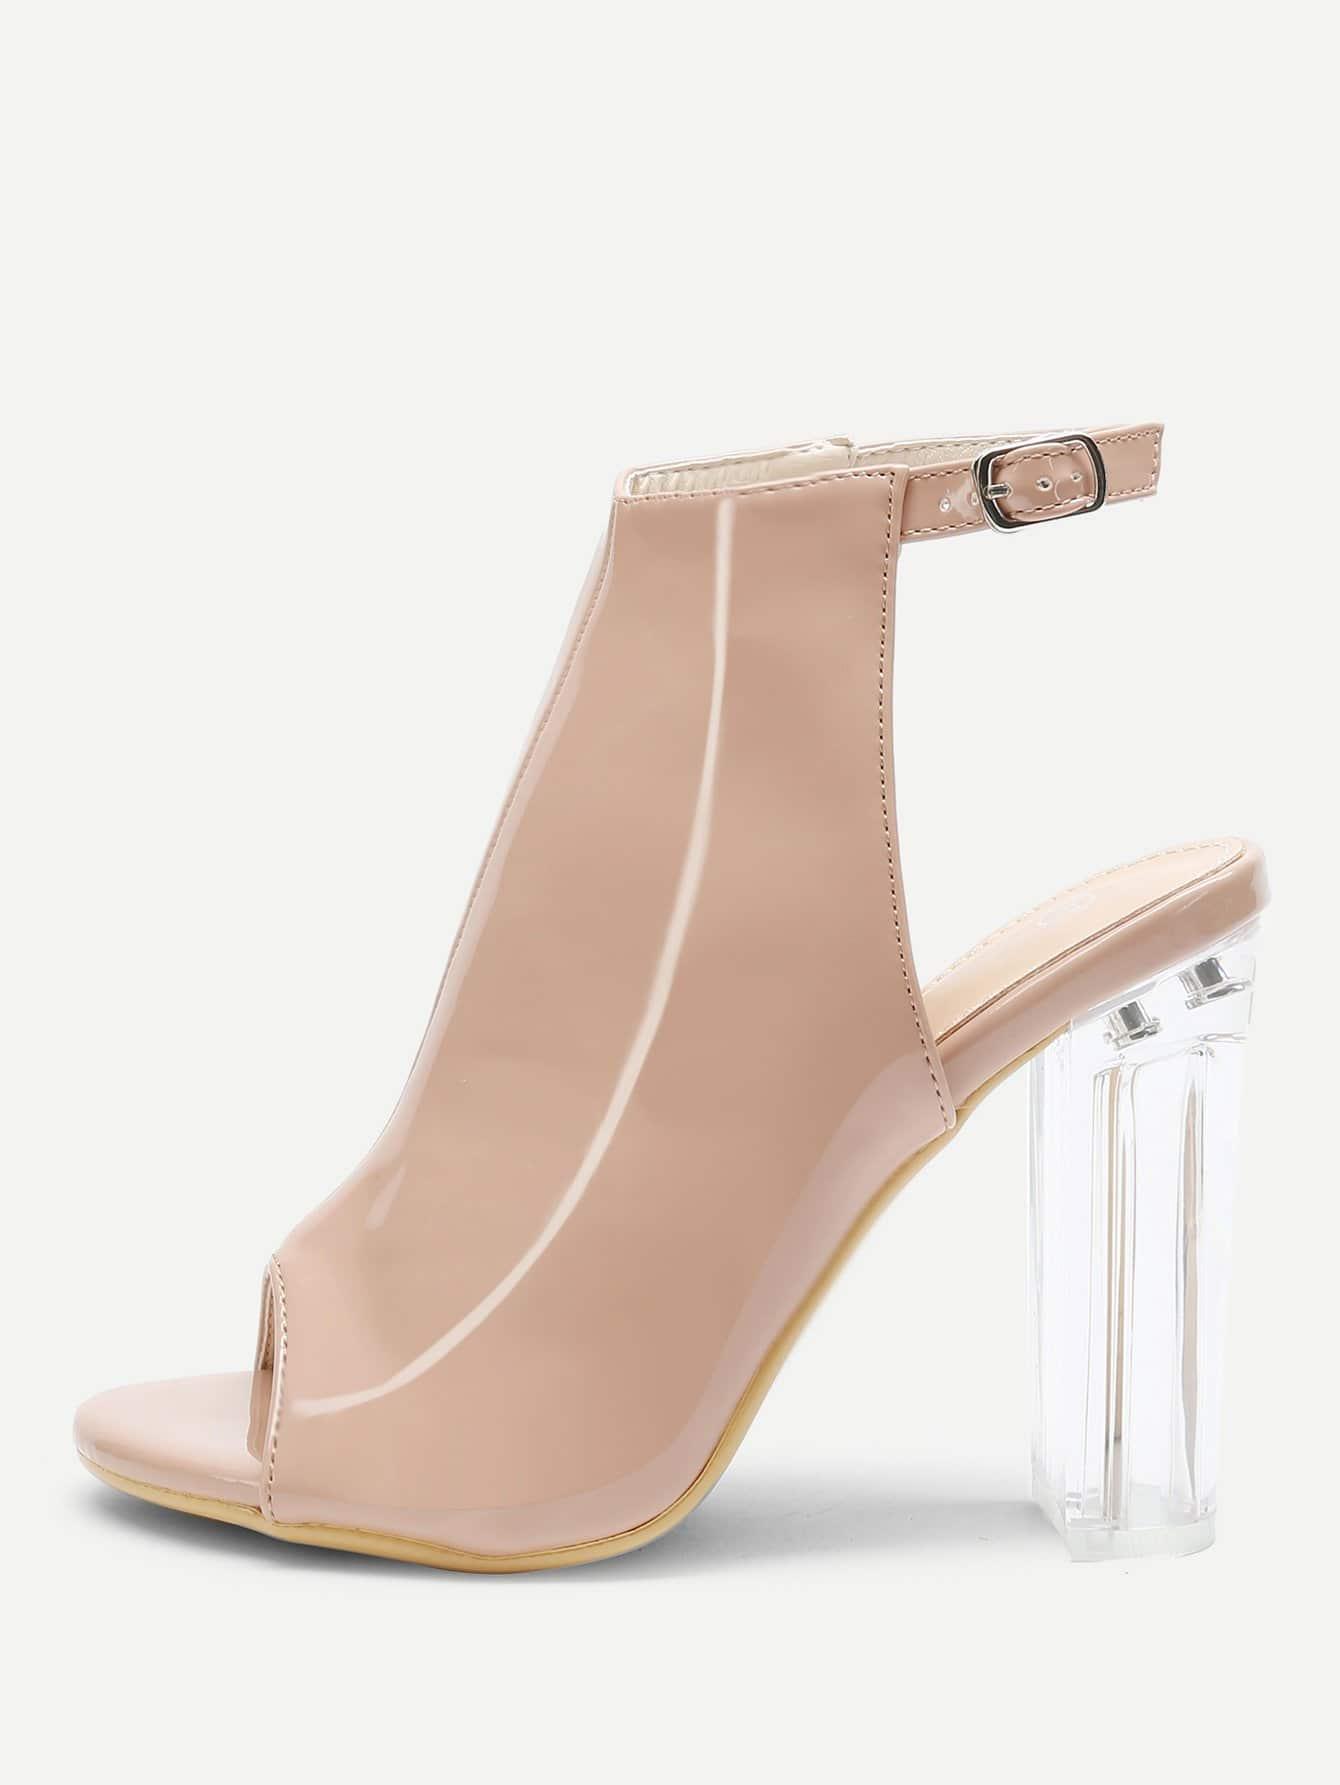 Фото Peep Toe Buckle Strap Chunky Heels closed toe v cut chunky heels mauve